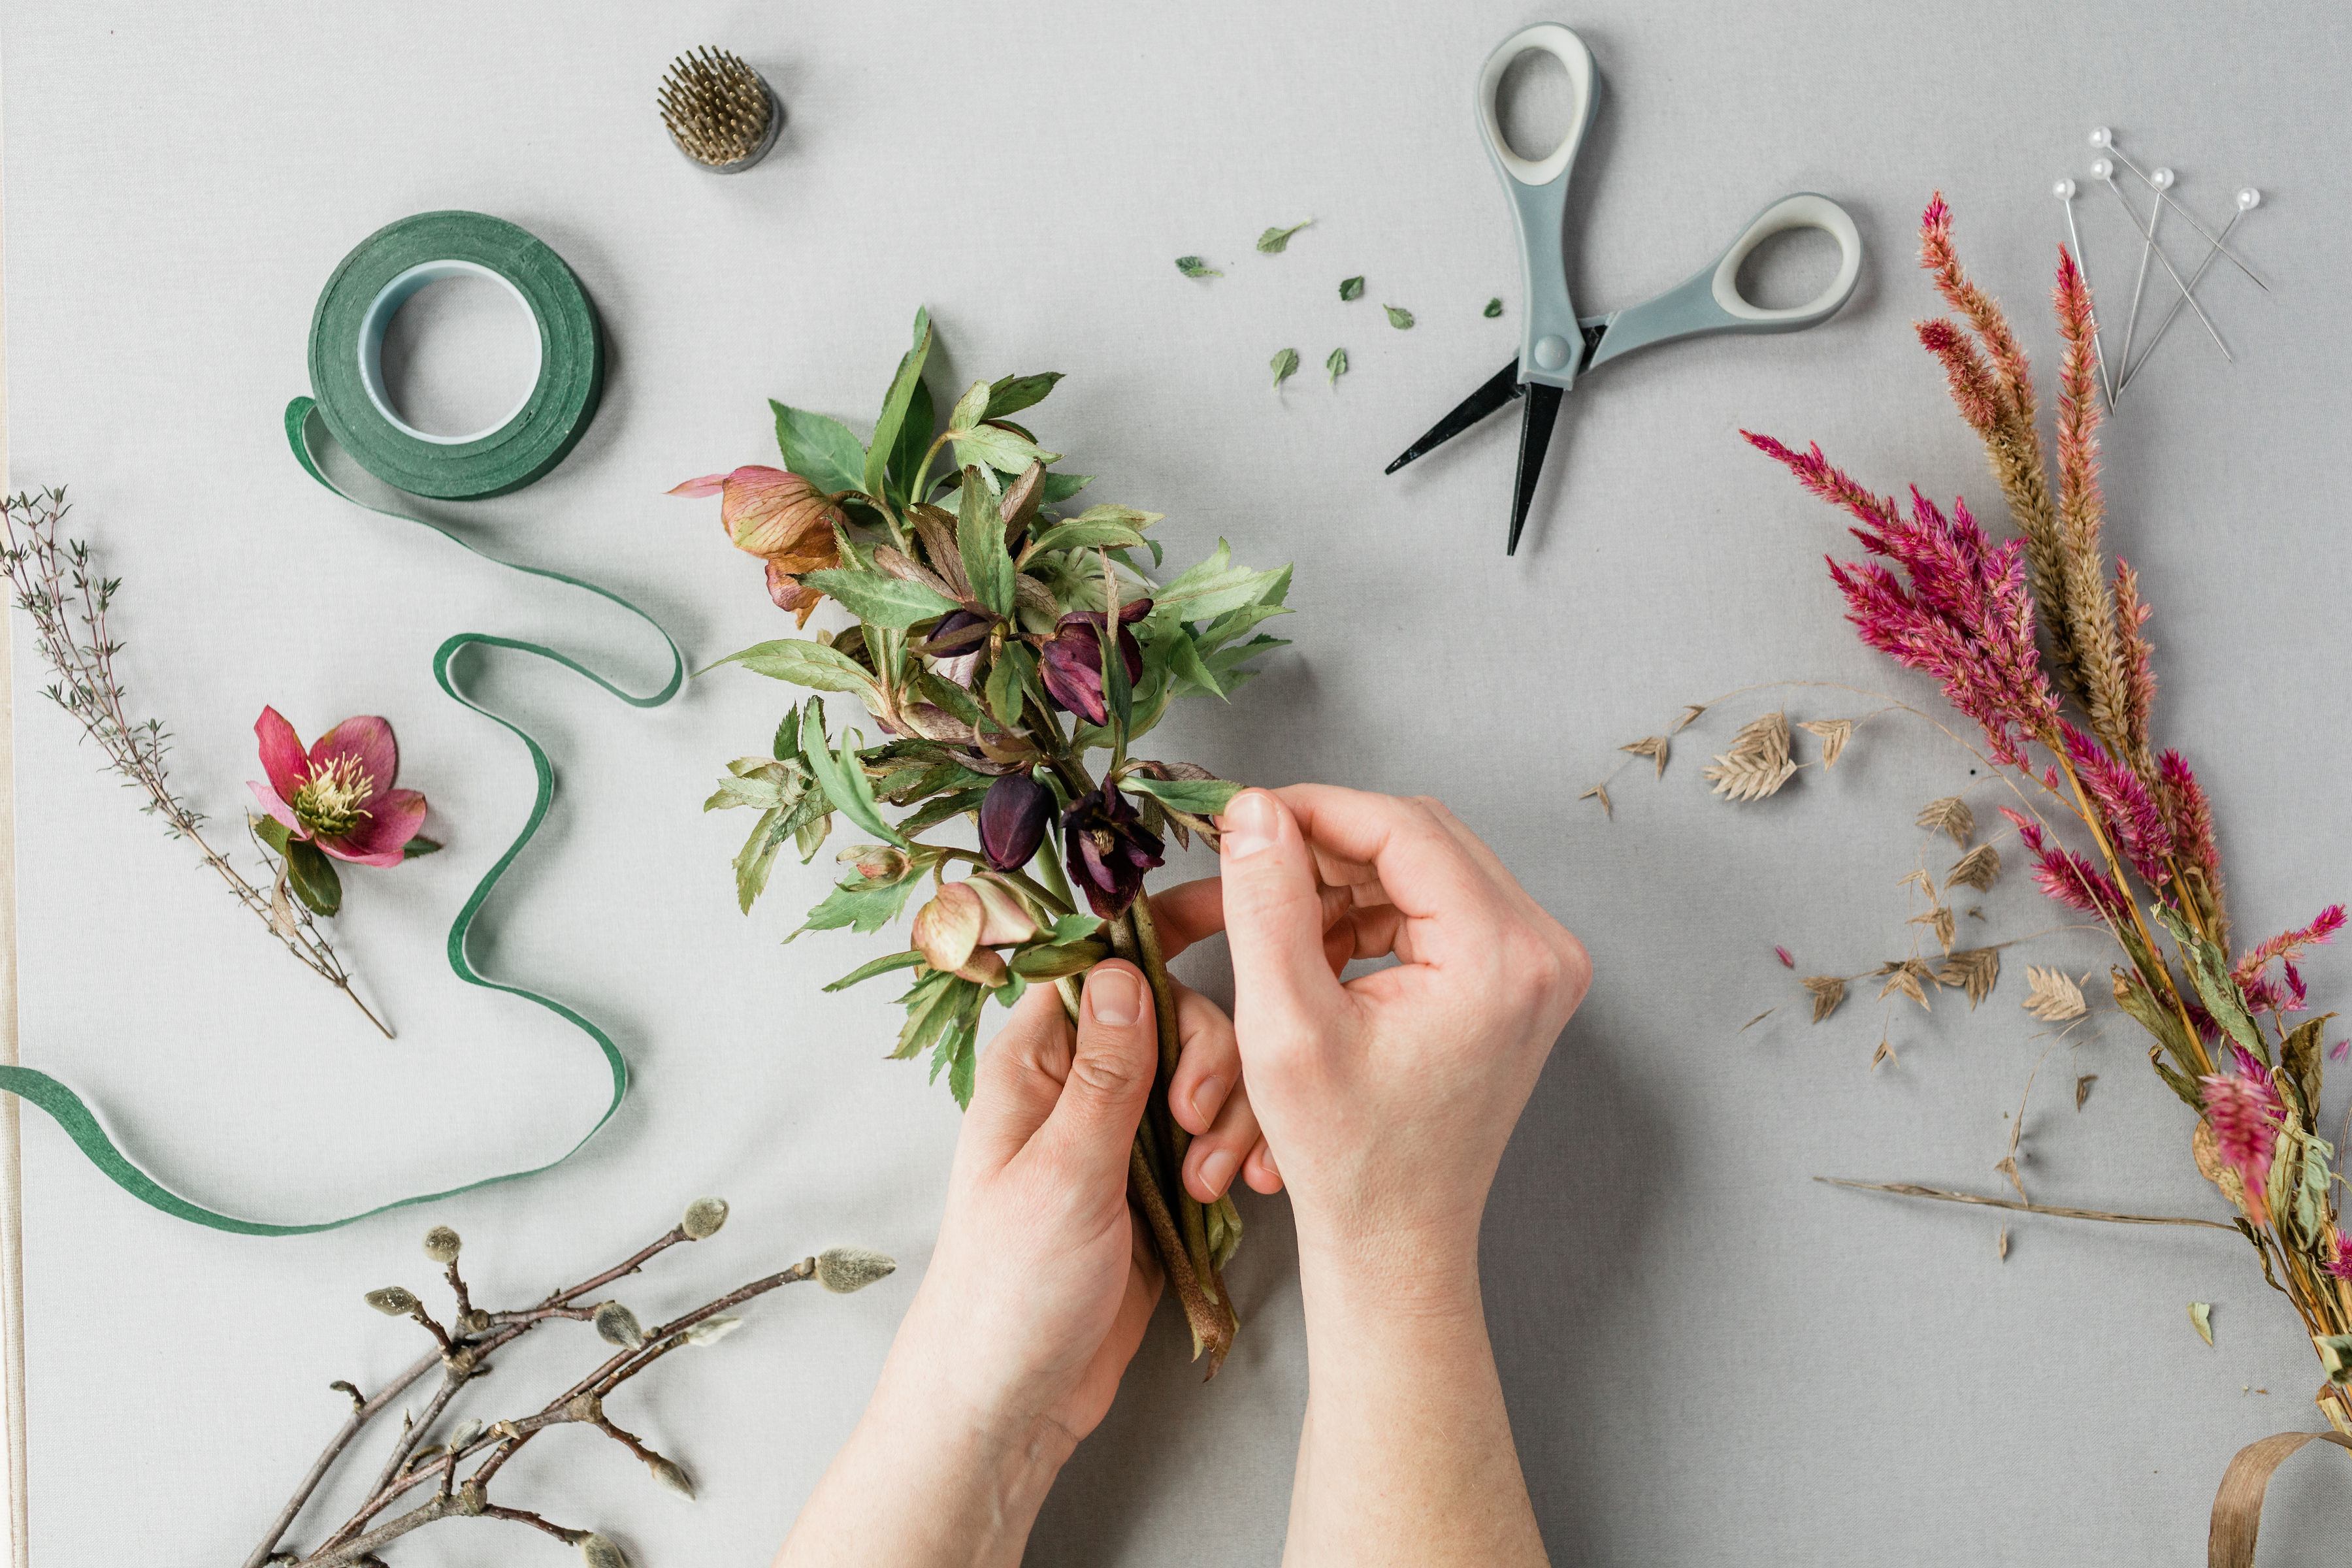 evansville florist, flower design classes, flower bar, evansville indiana